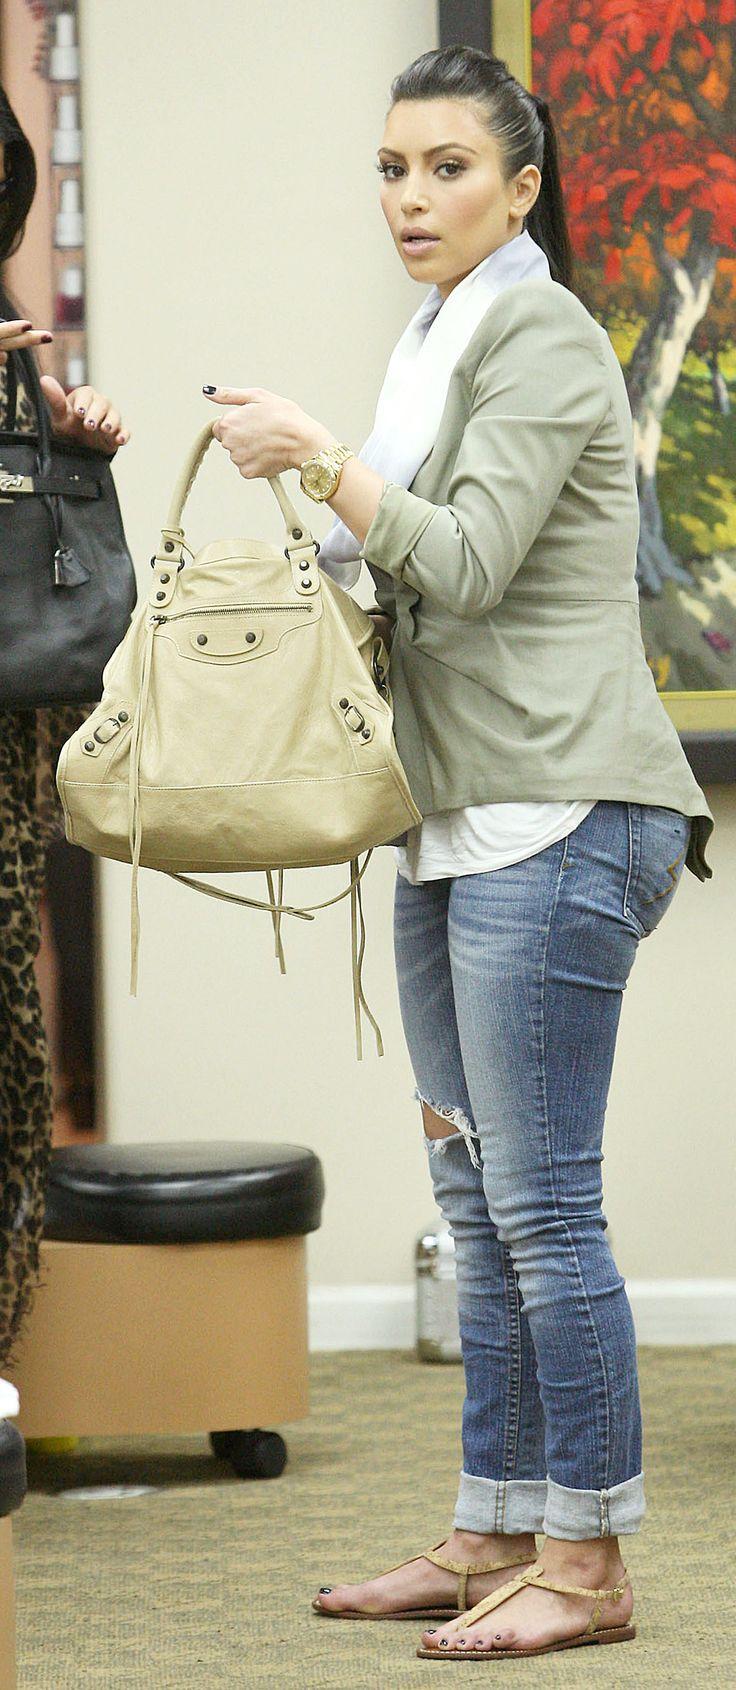 Kim Kardashian, nude flat sandals, white top, grey blazer, jeans, beige bag ☑️